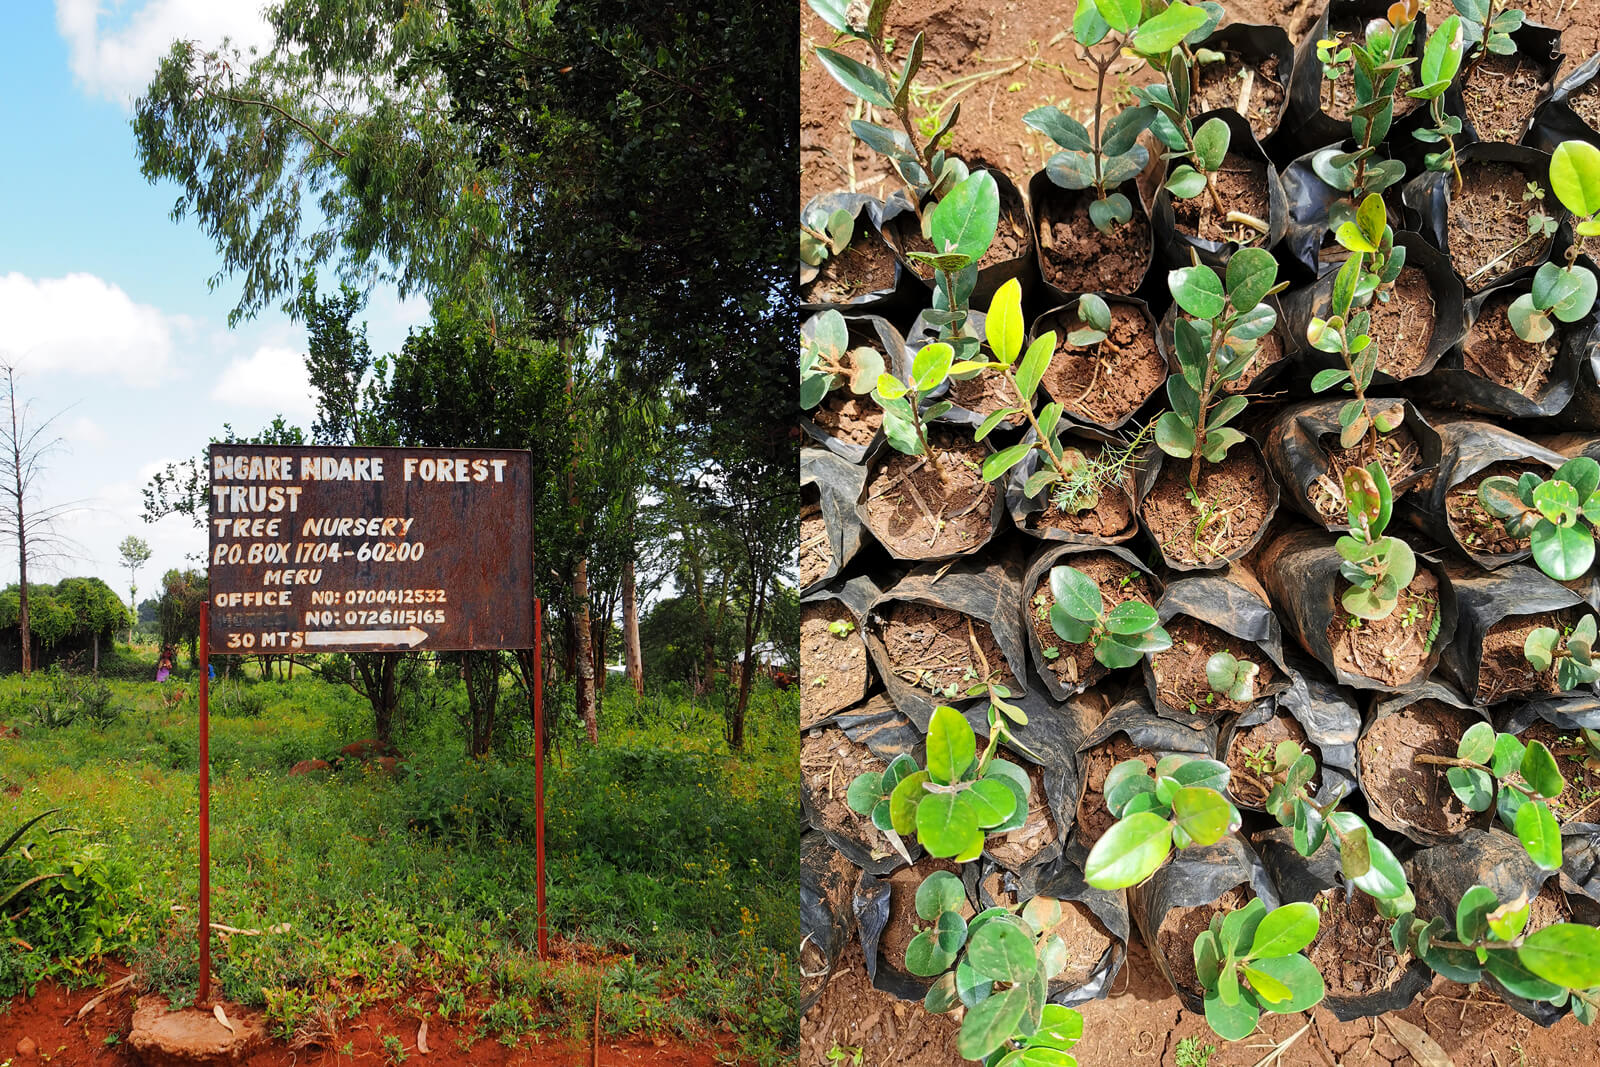 Ngare Ndare Forest Trust Nursery